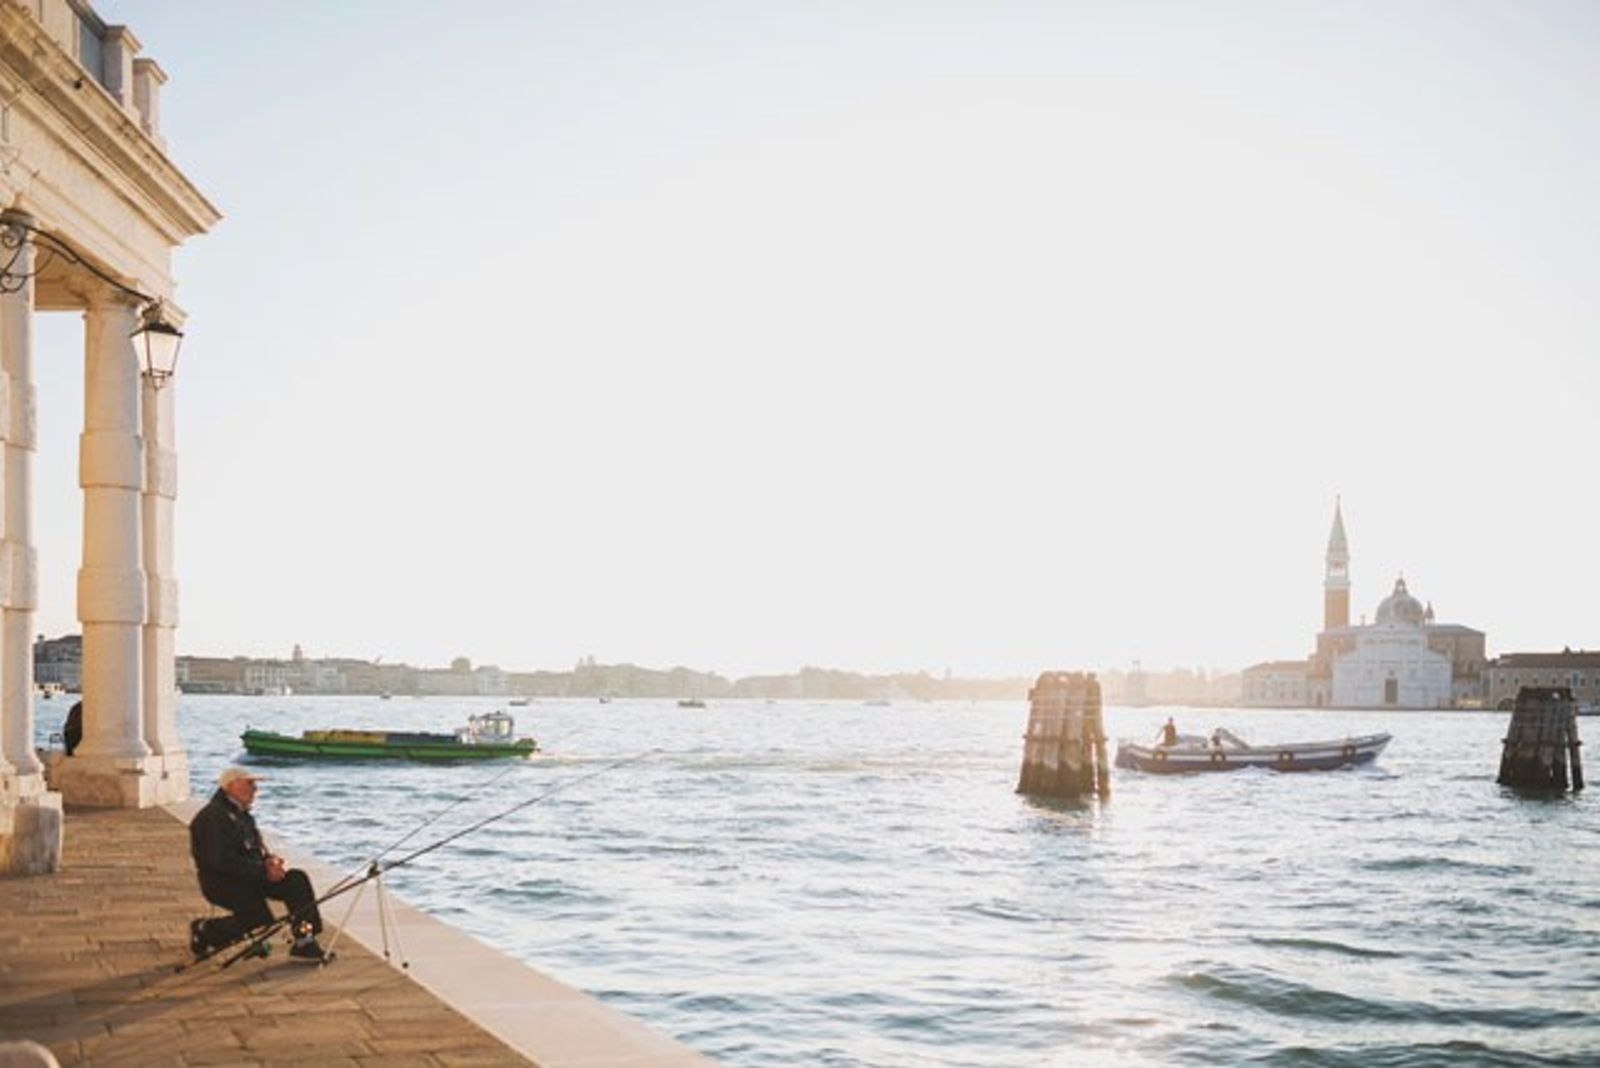 Neighbourhood guide to Venice